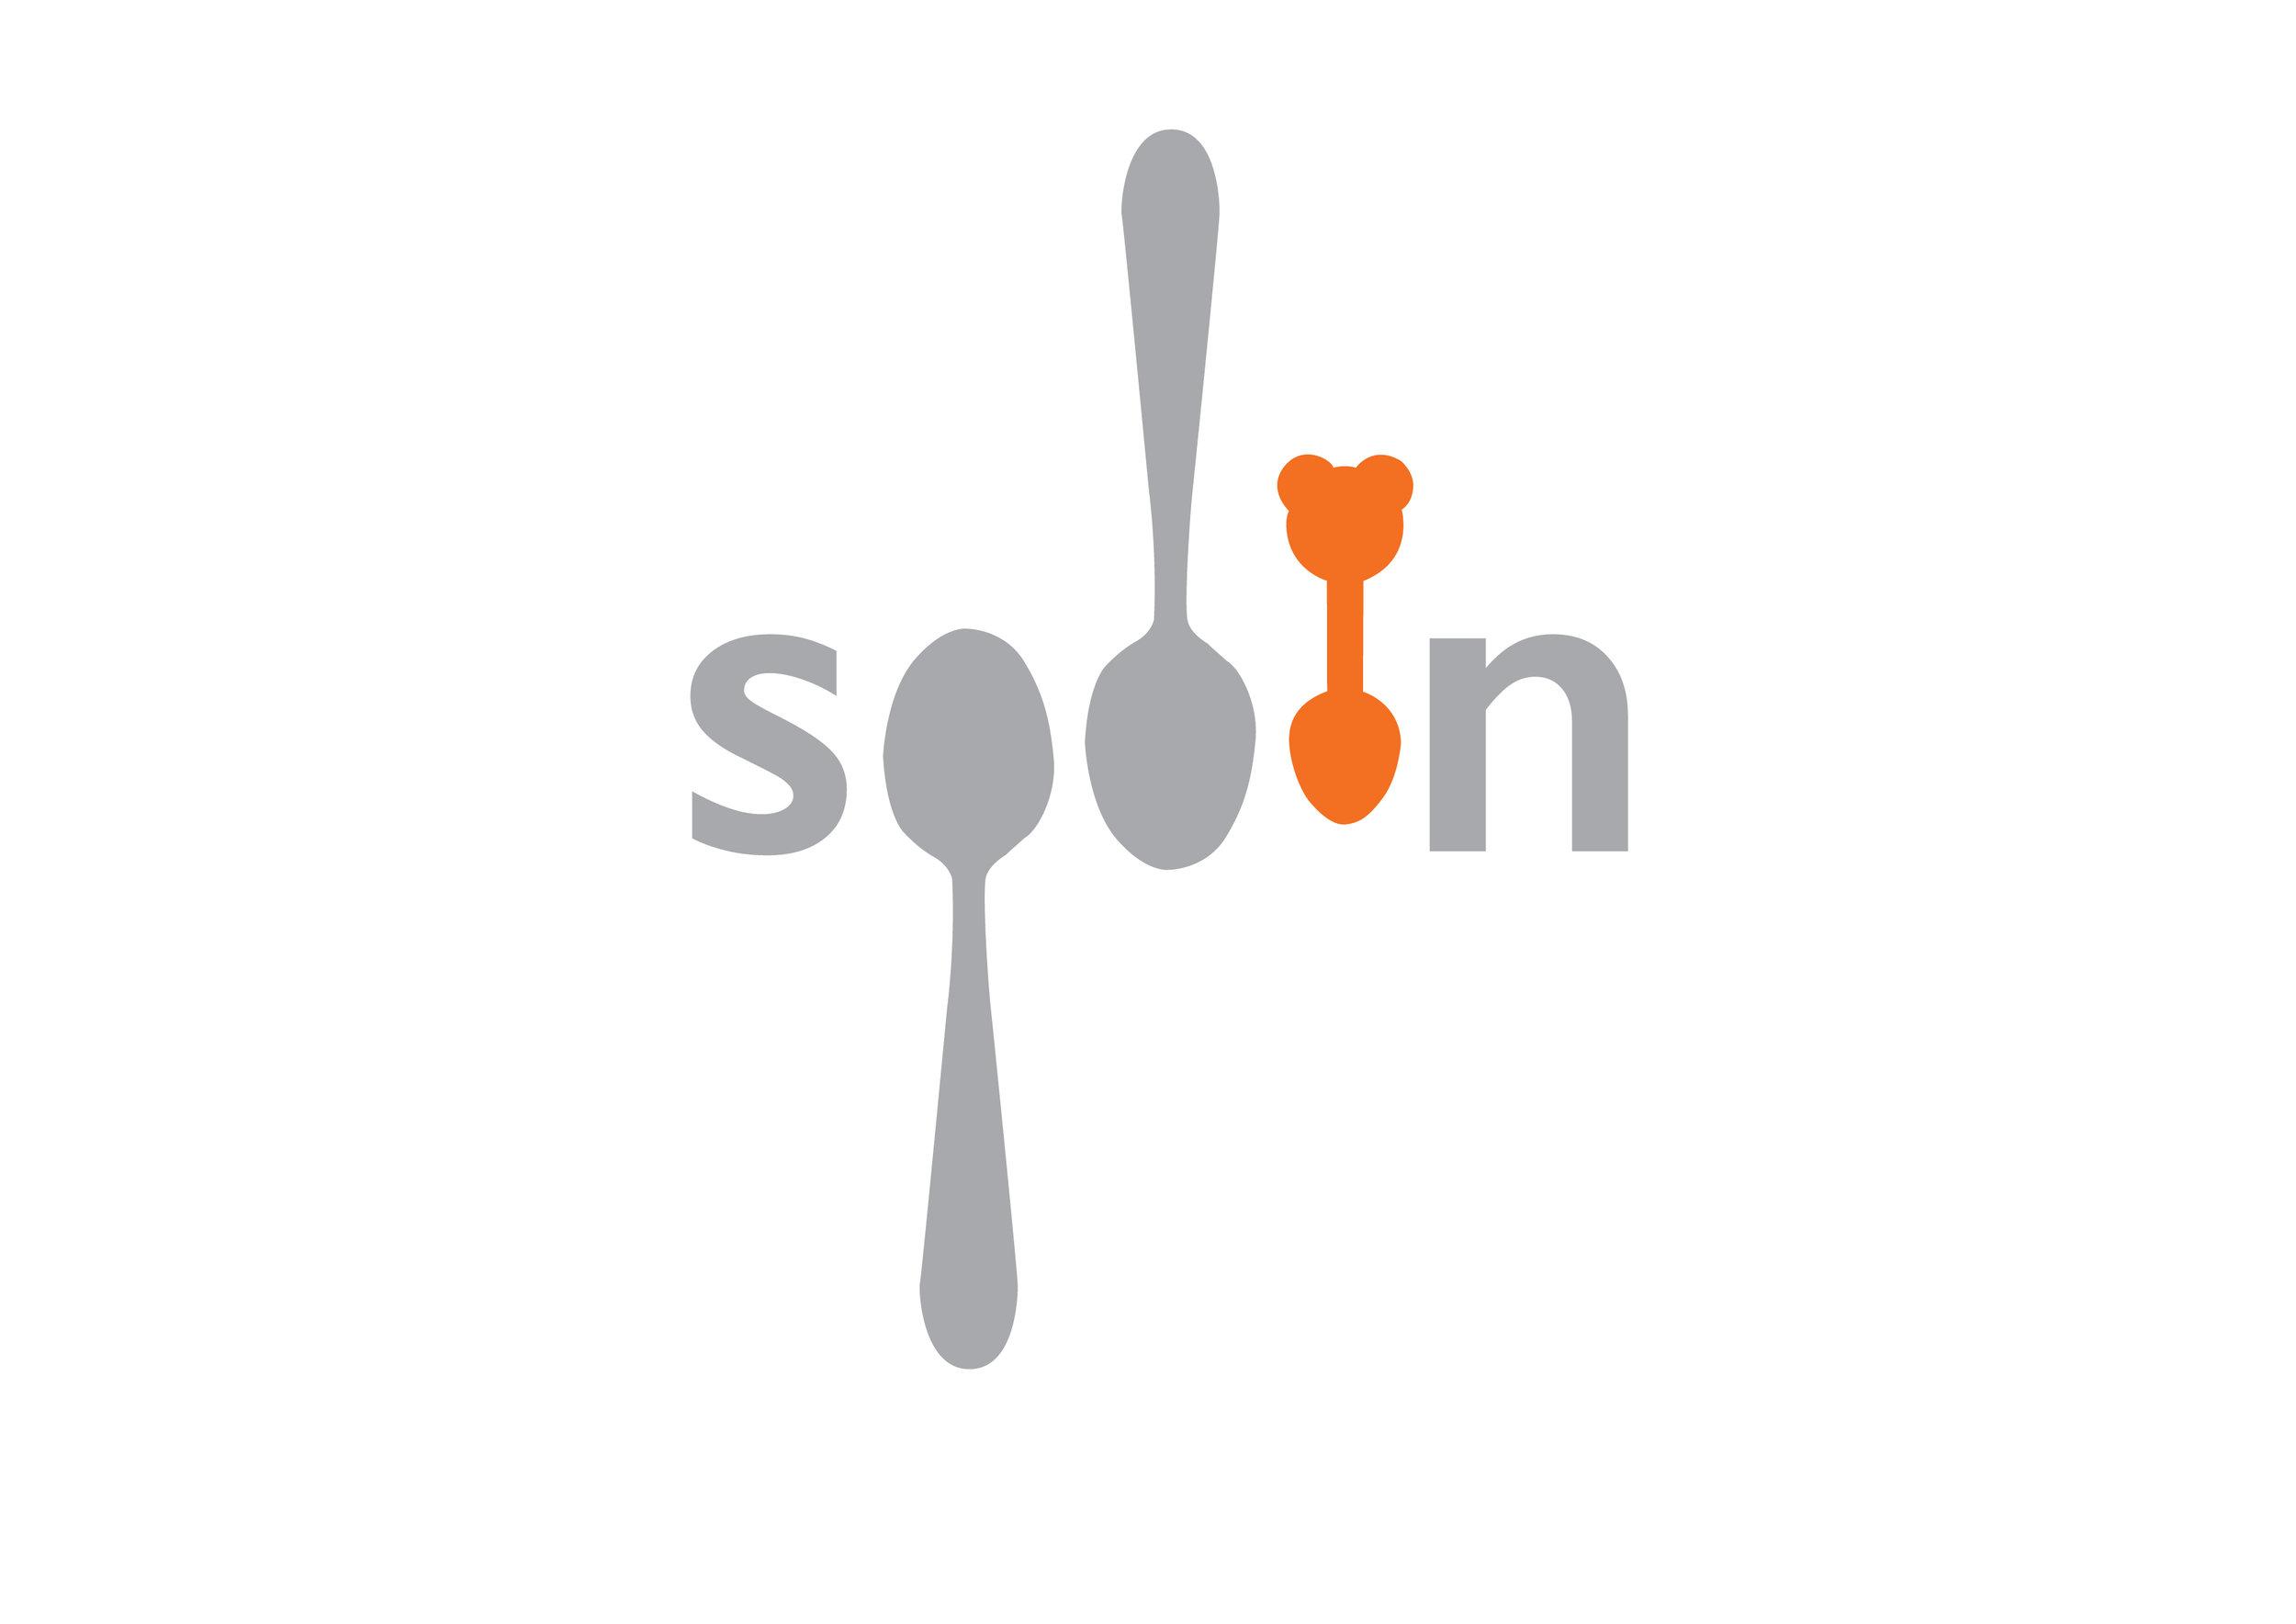 spoon logo colour BG.JPG